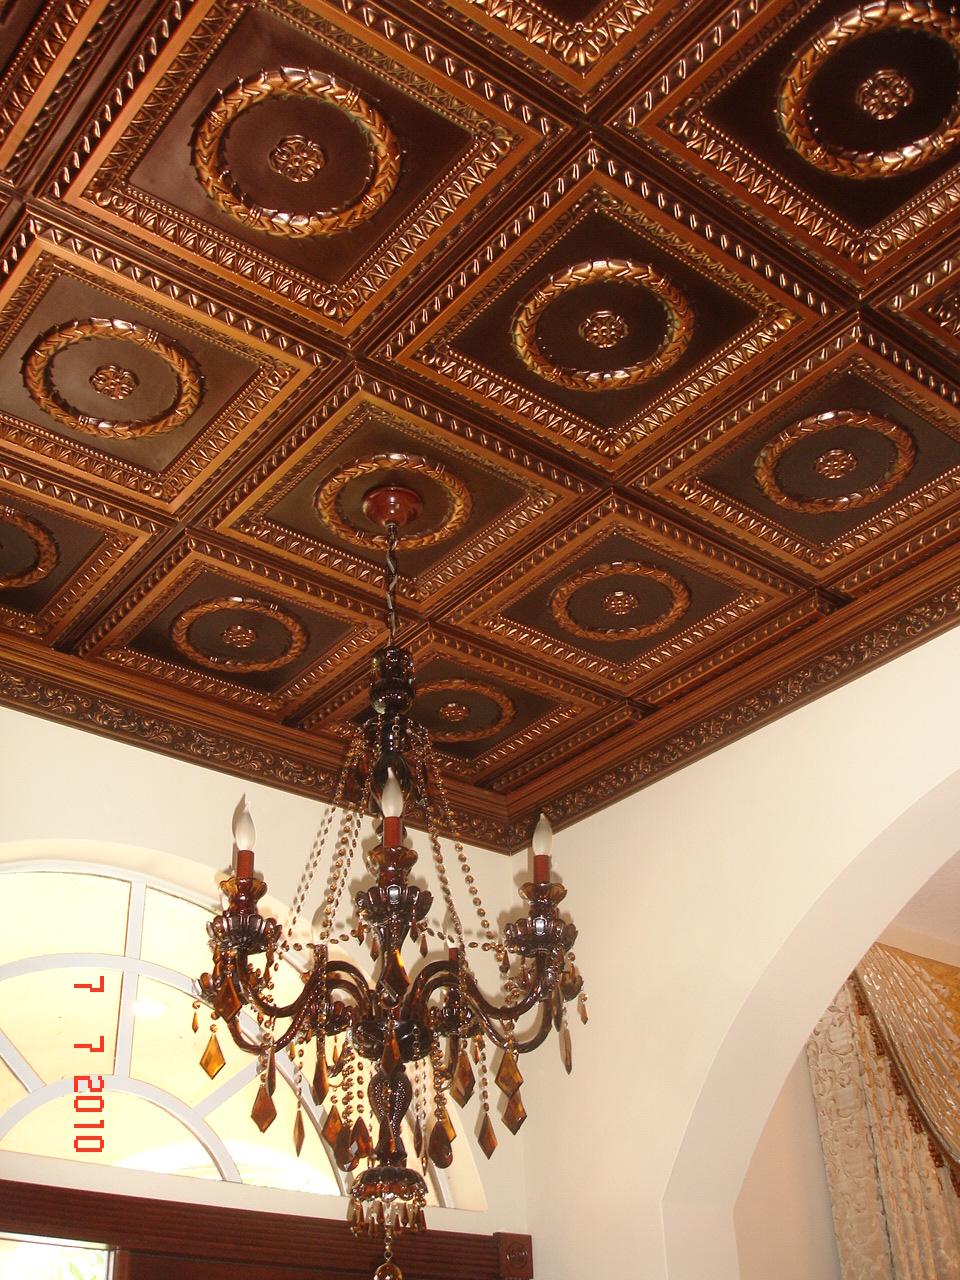 210-faux-tin-ceiling-tiles-installed-in-boc-raton-florida.jpg